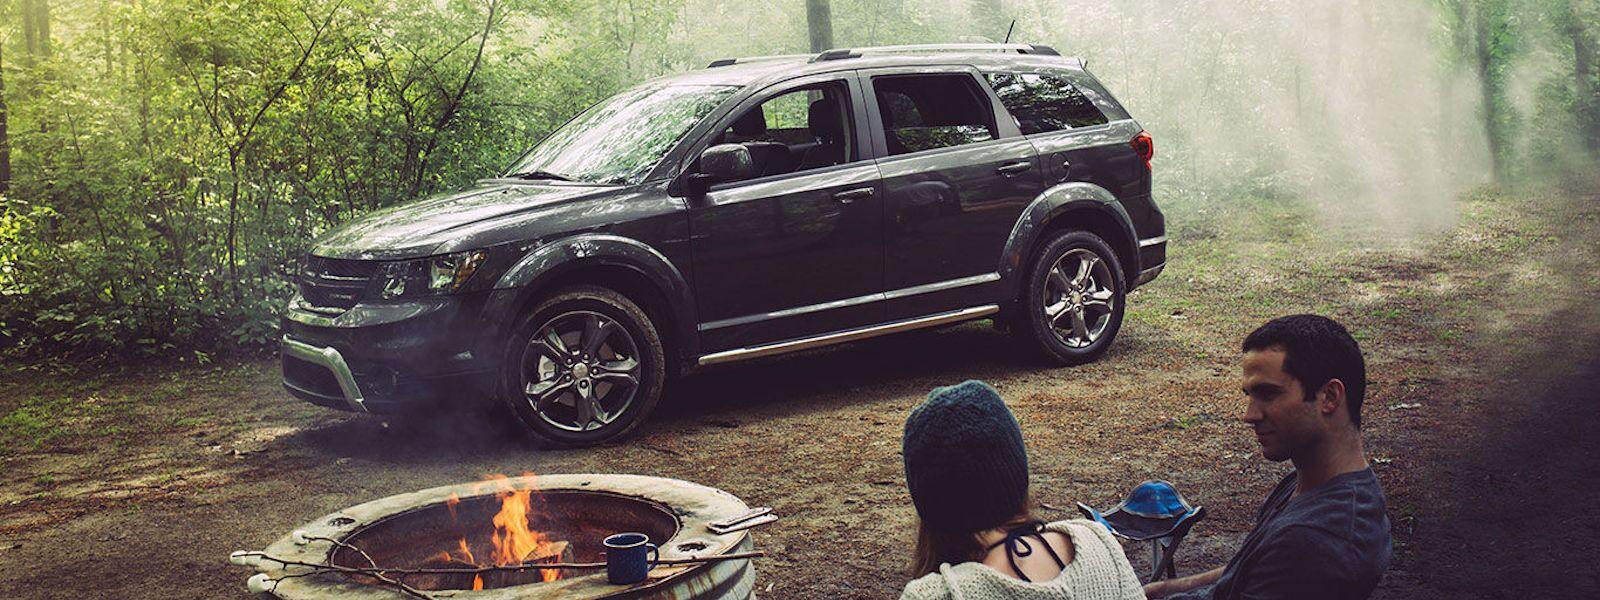 2016 Dodge Journey Safety